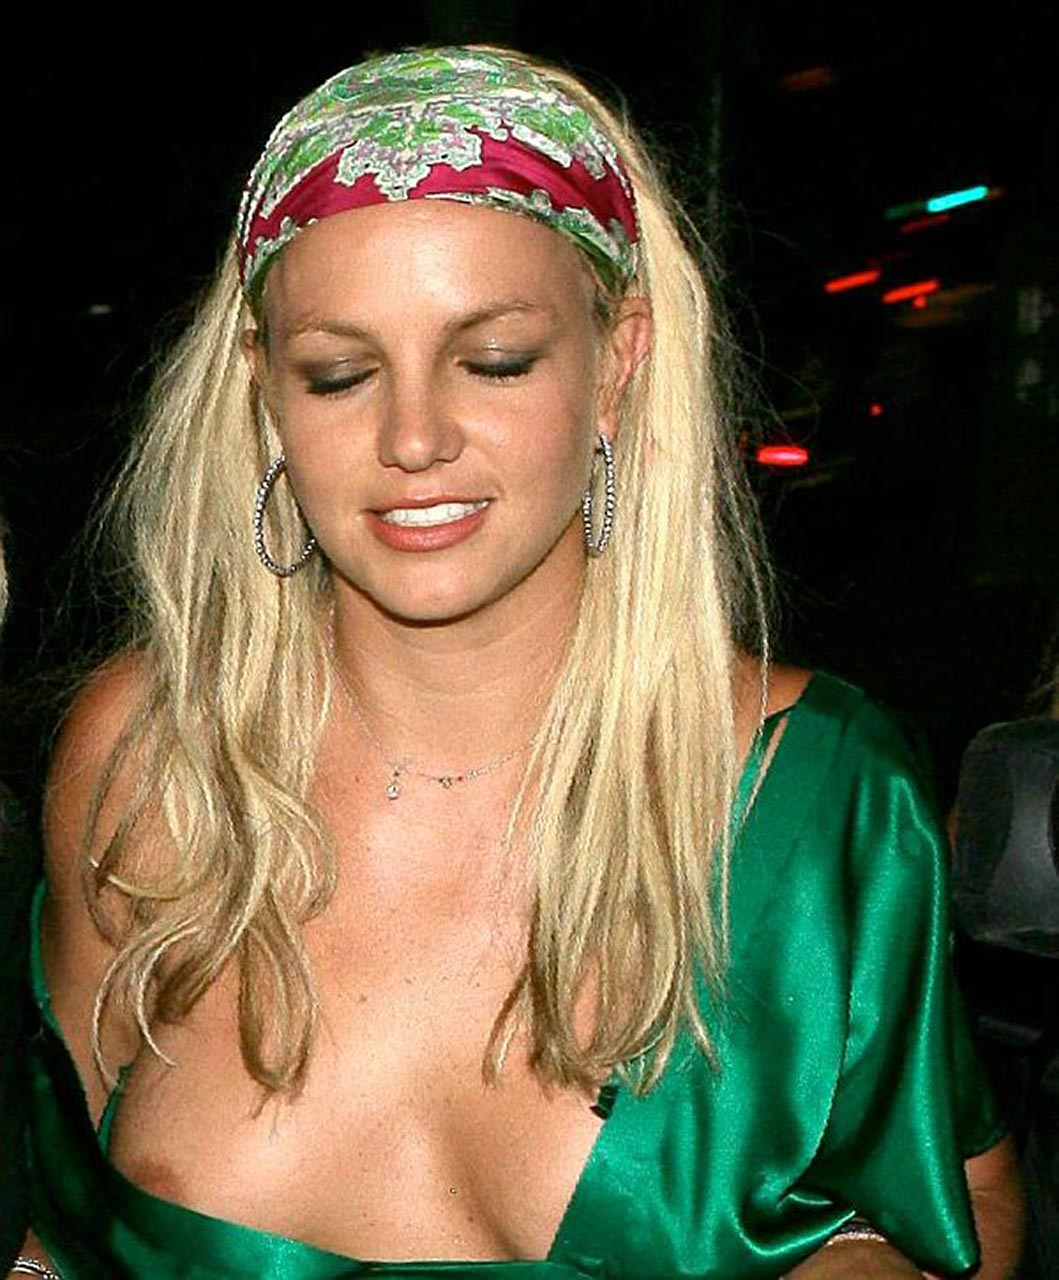 Britney Spears Boobs